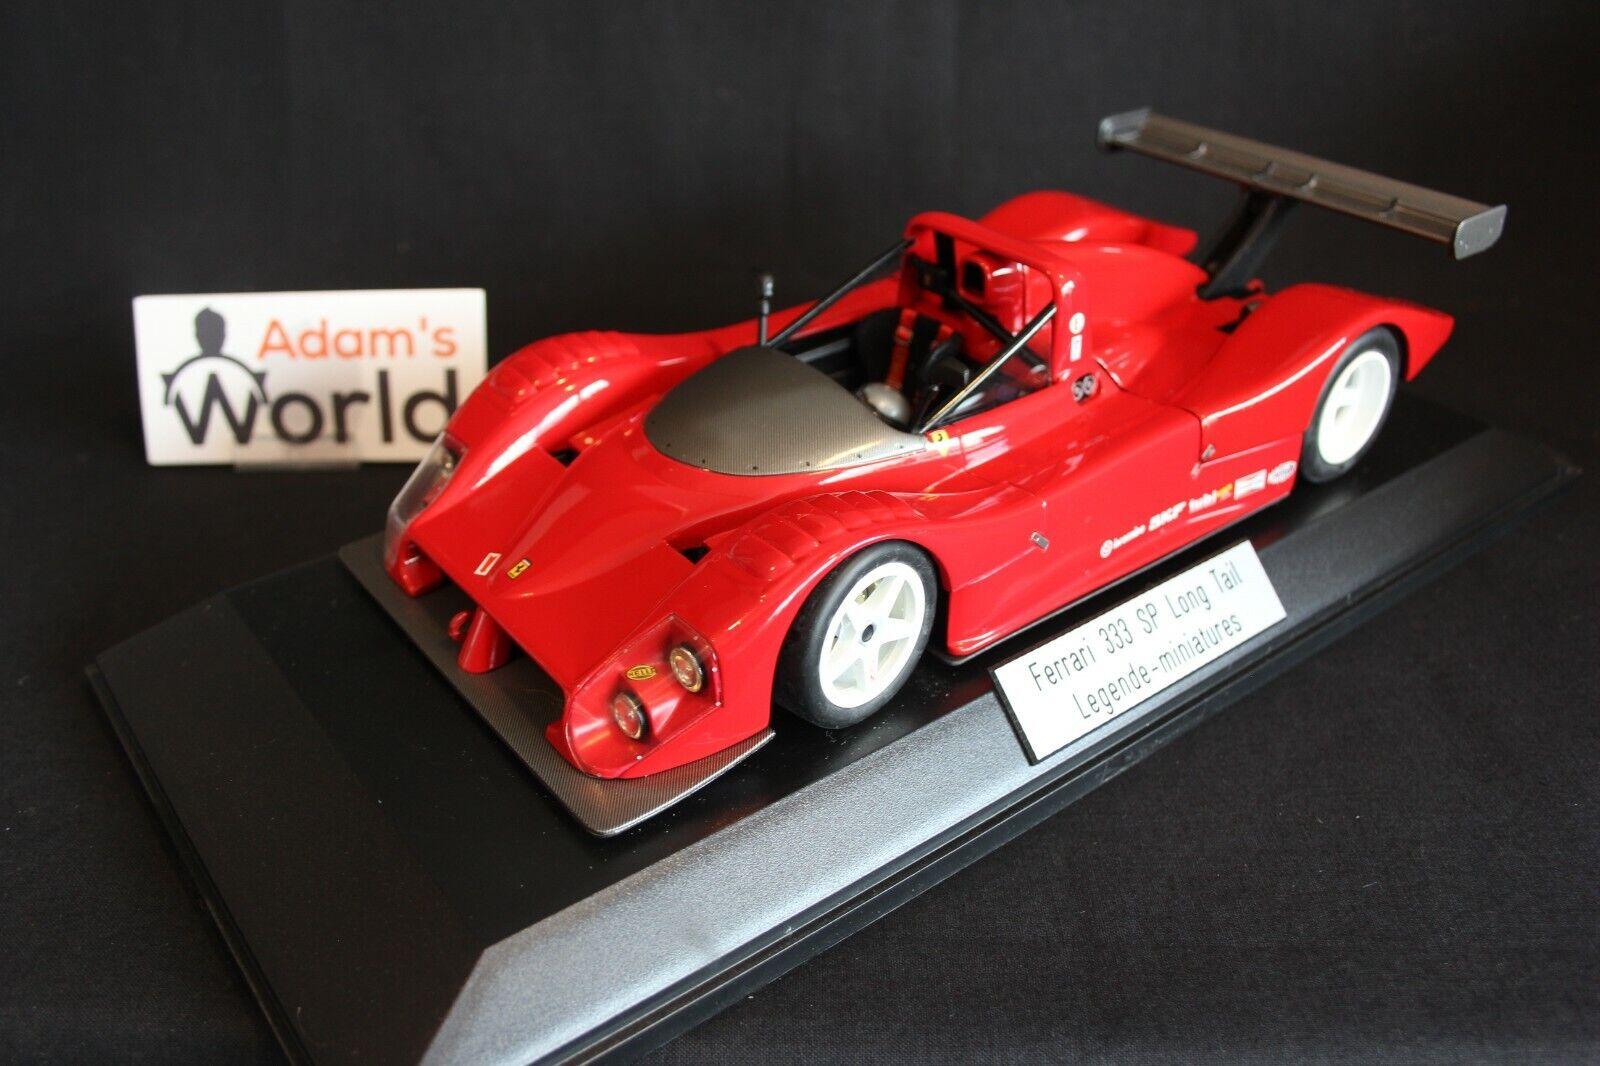 wholesape barato Hot Wheels transkit Ferrari 333 SP 1 18 Long Tail Tail Tail version (PJBB)  Entrega gratuita y rápida disponible.